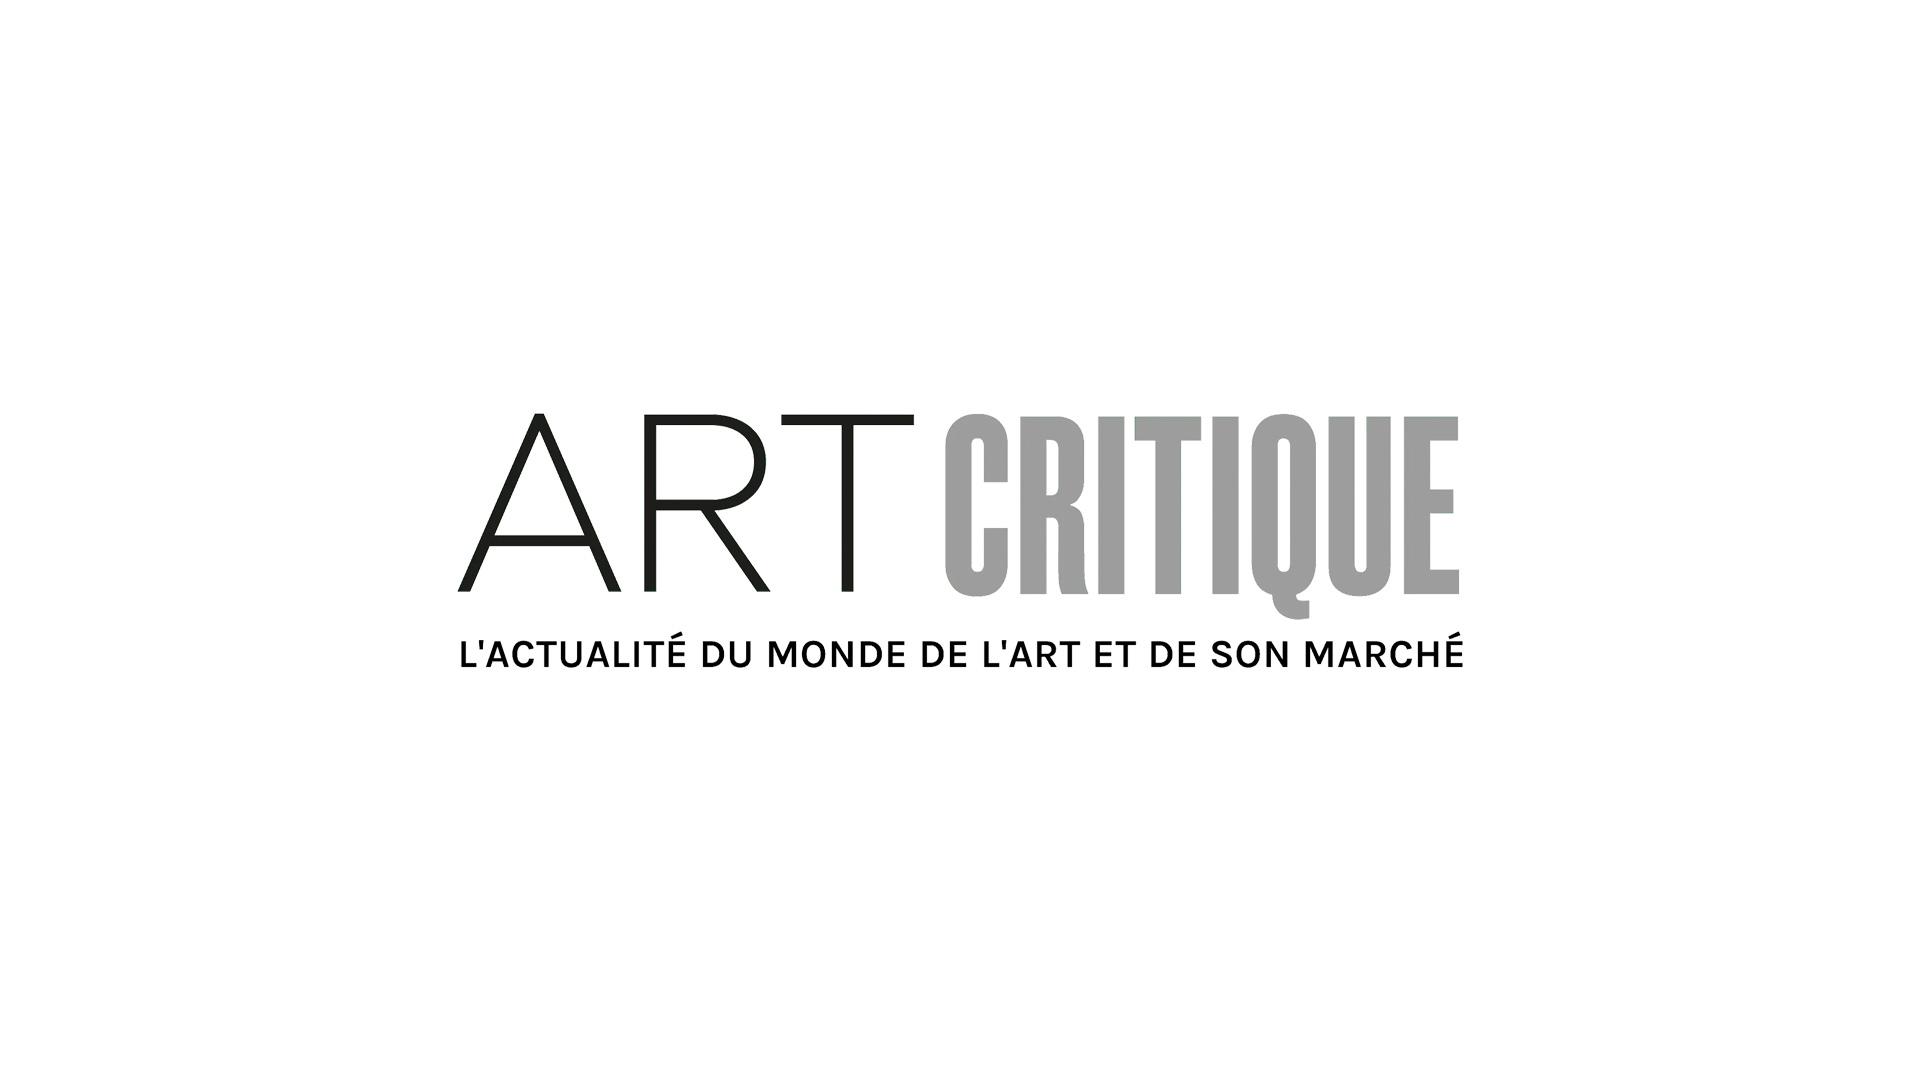 J. Paul Getty Trust dedicates $100 million to worldwide heritage sites